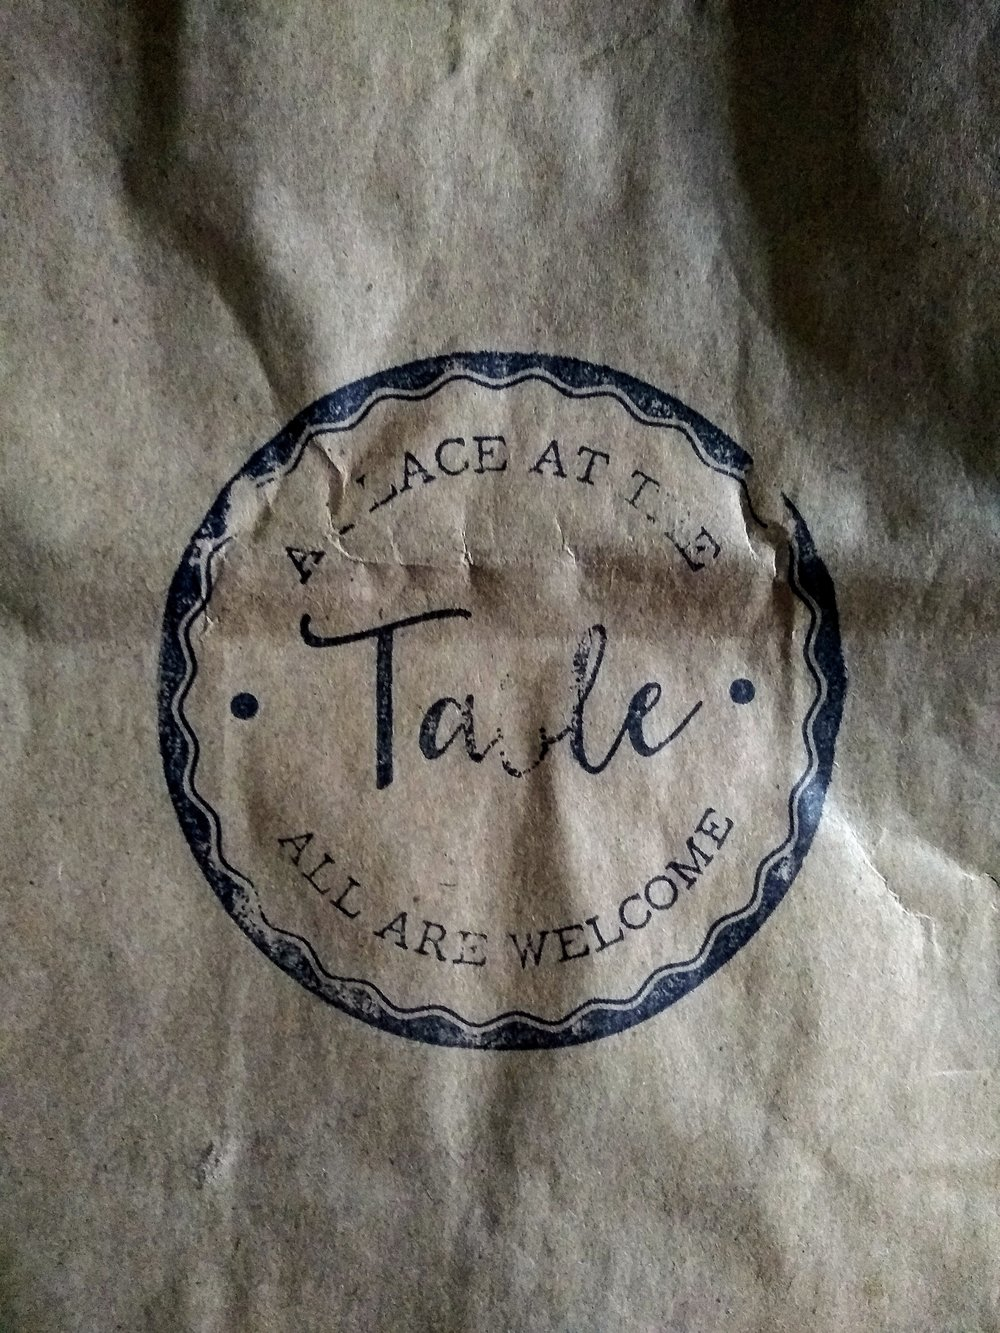 My paper bag souvenir.